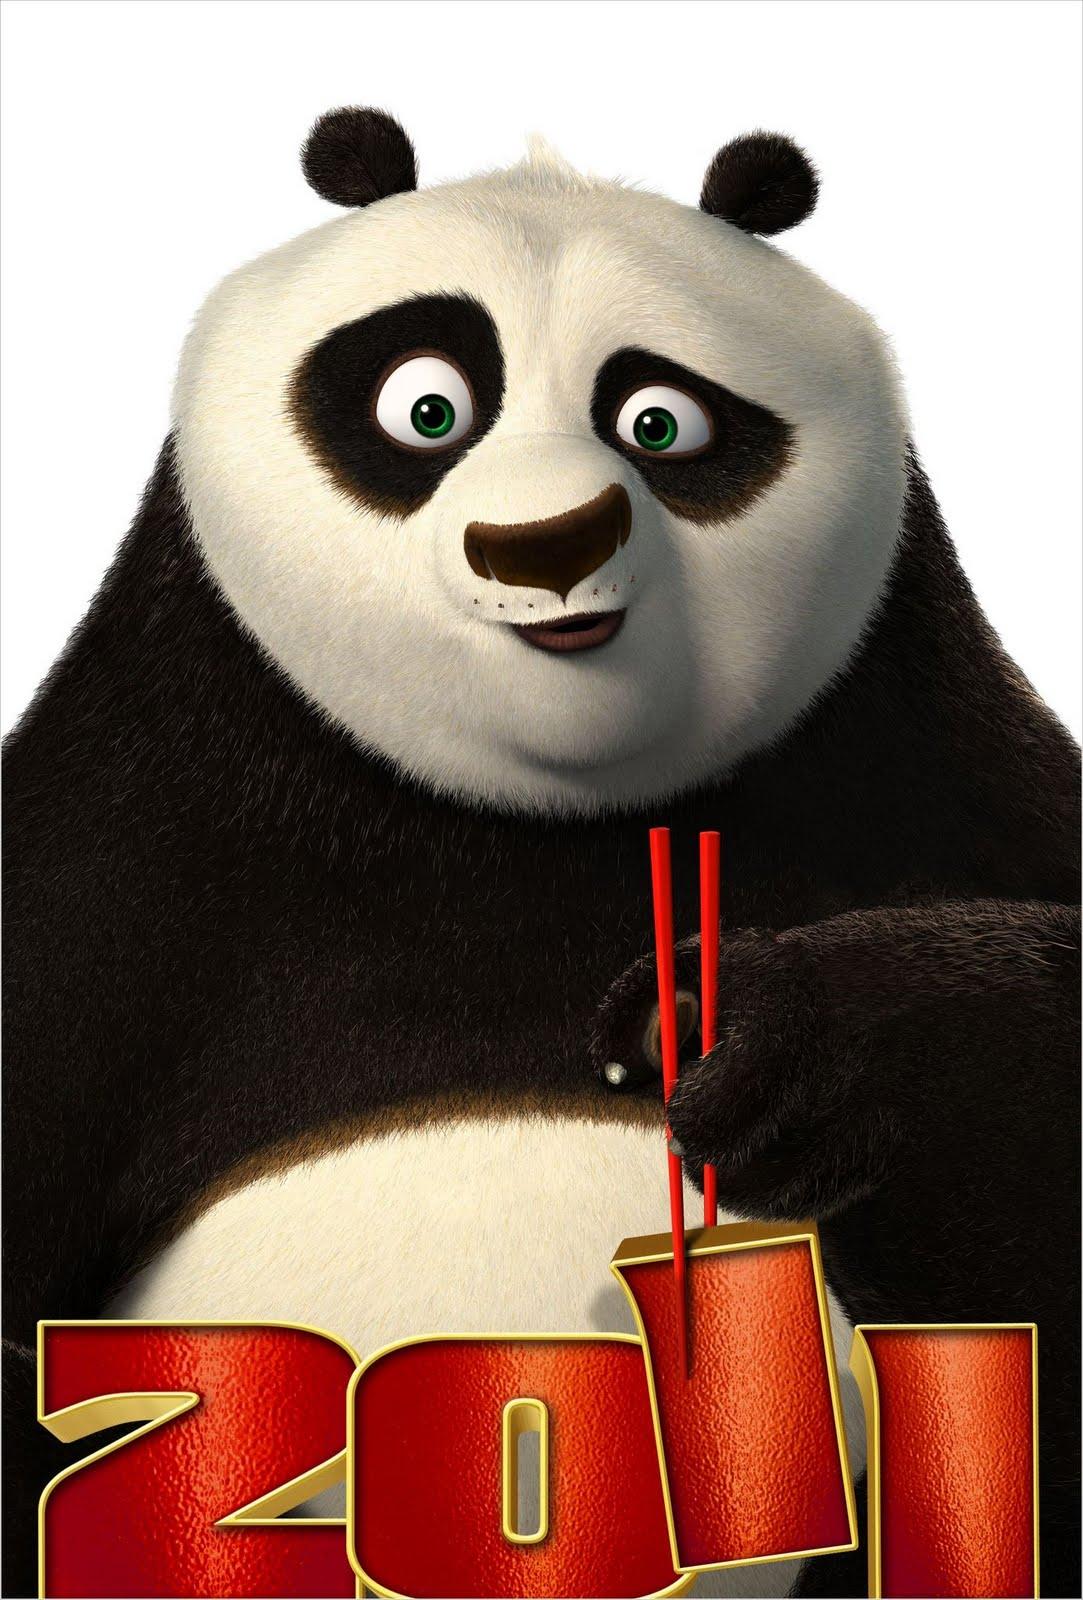 Panda Anime Wallpaper Kung Fu Panda 2 3d Hd Poster Wallpapers Cartoon Wallpapers